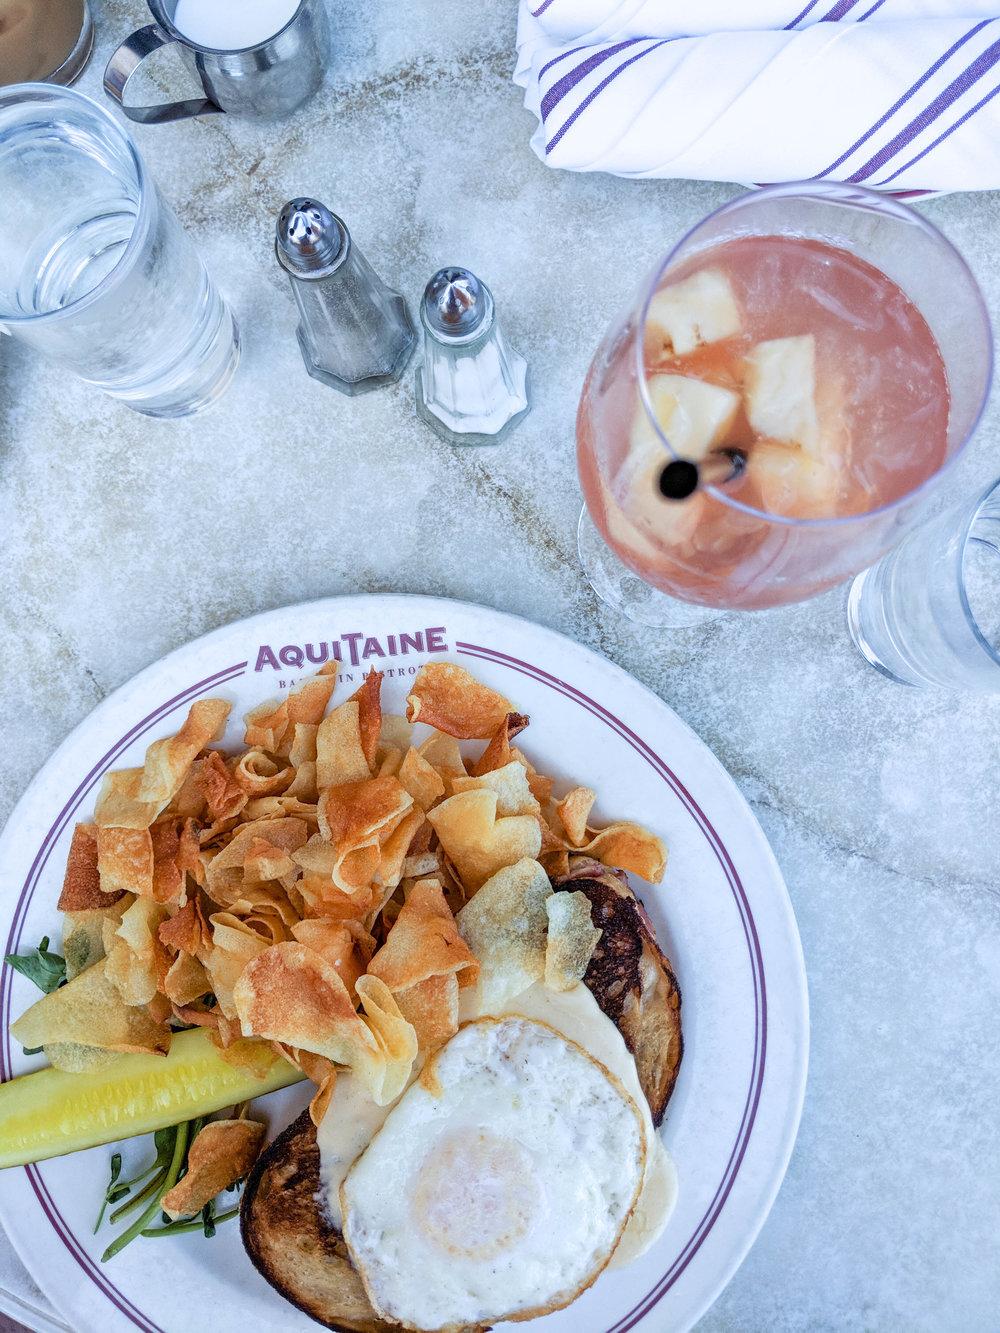 bri rinehart; photography; food; brunch